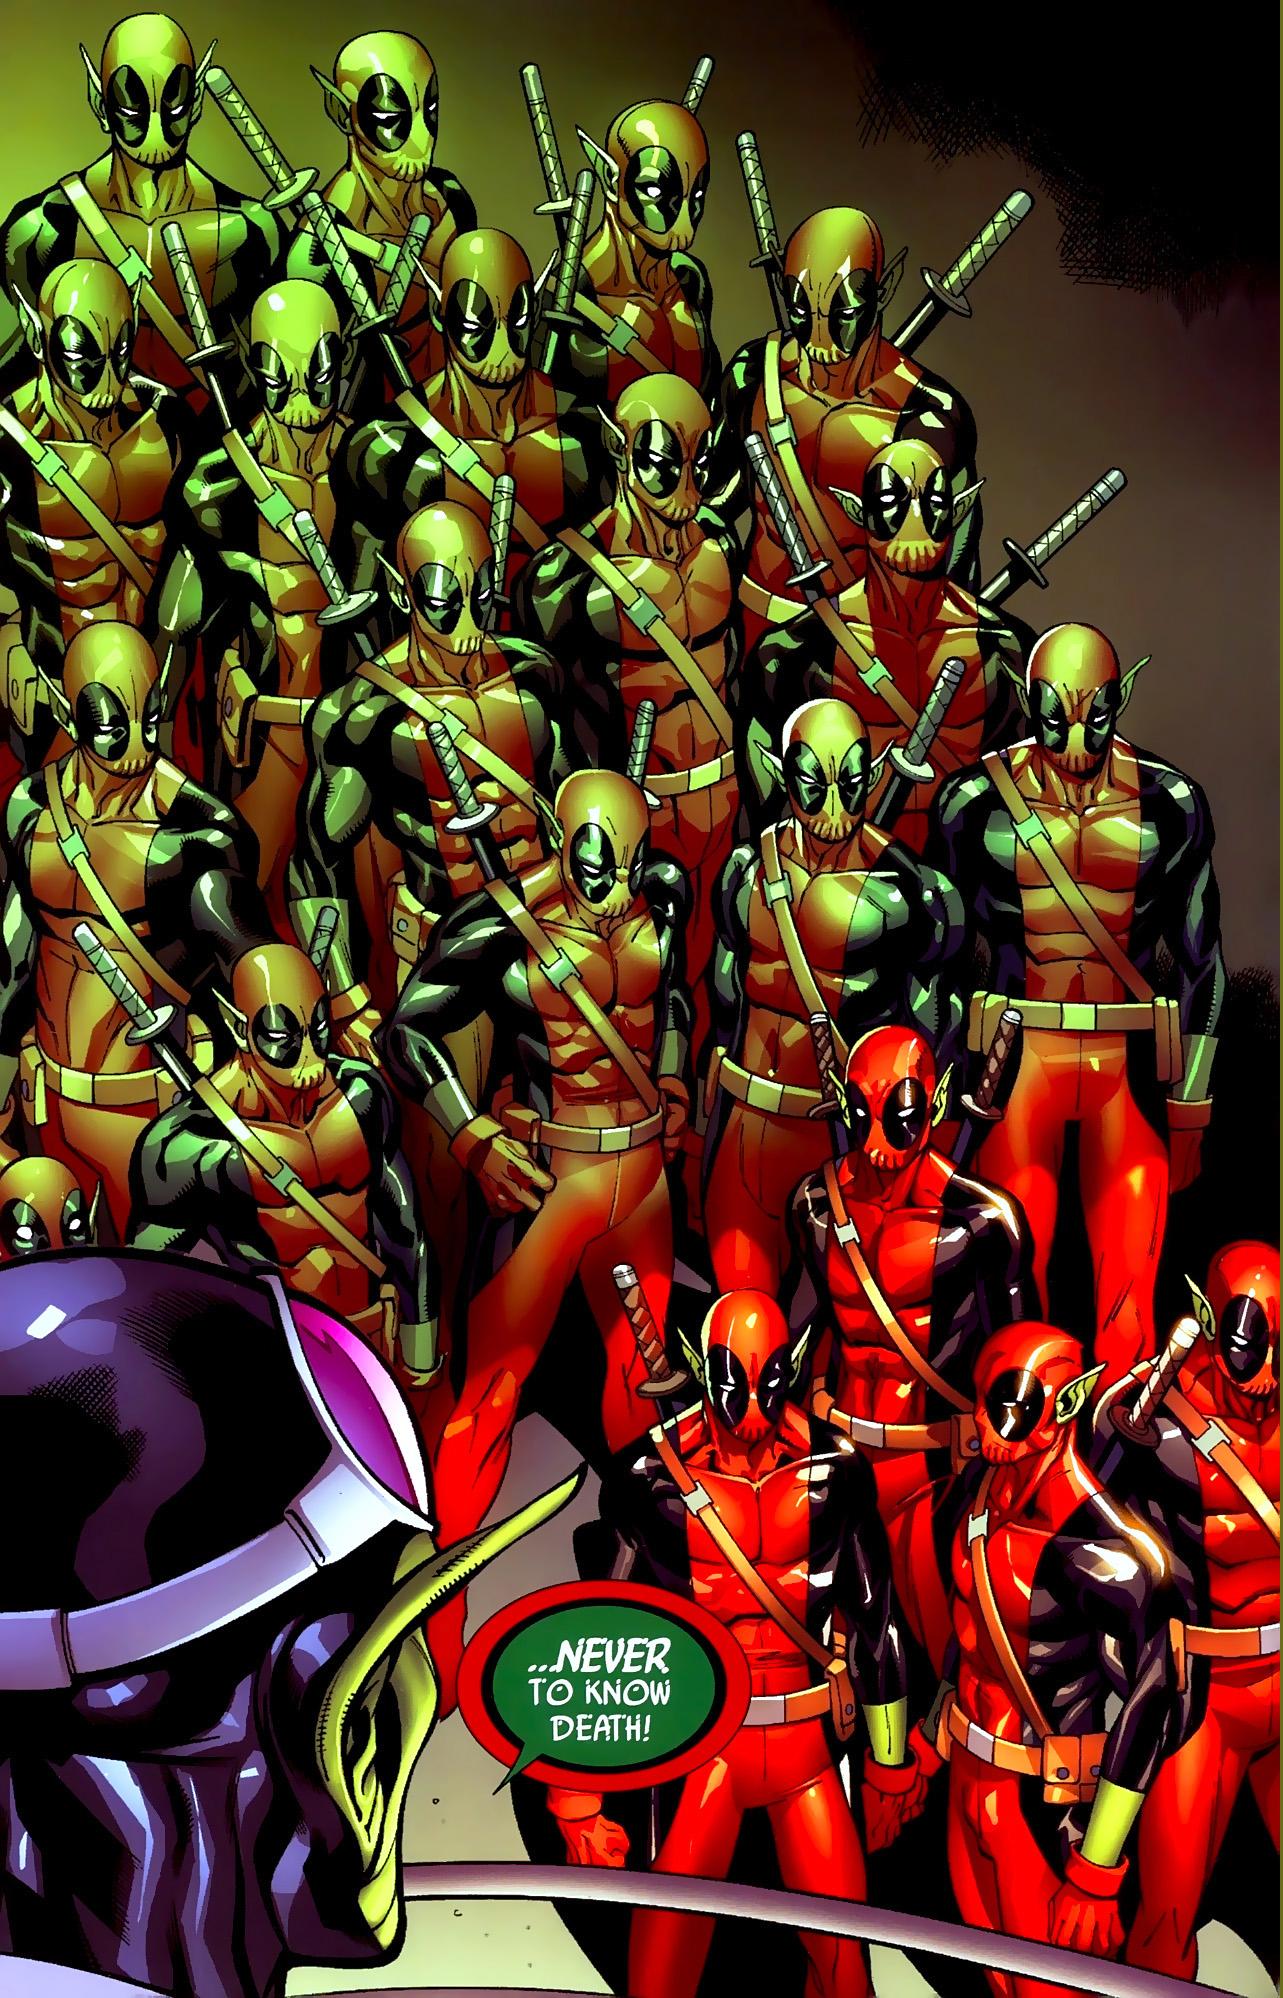 the skrulls create deadpool-type super-skrulls